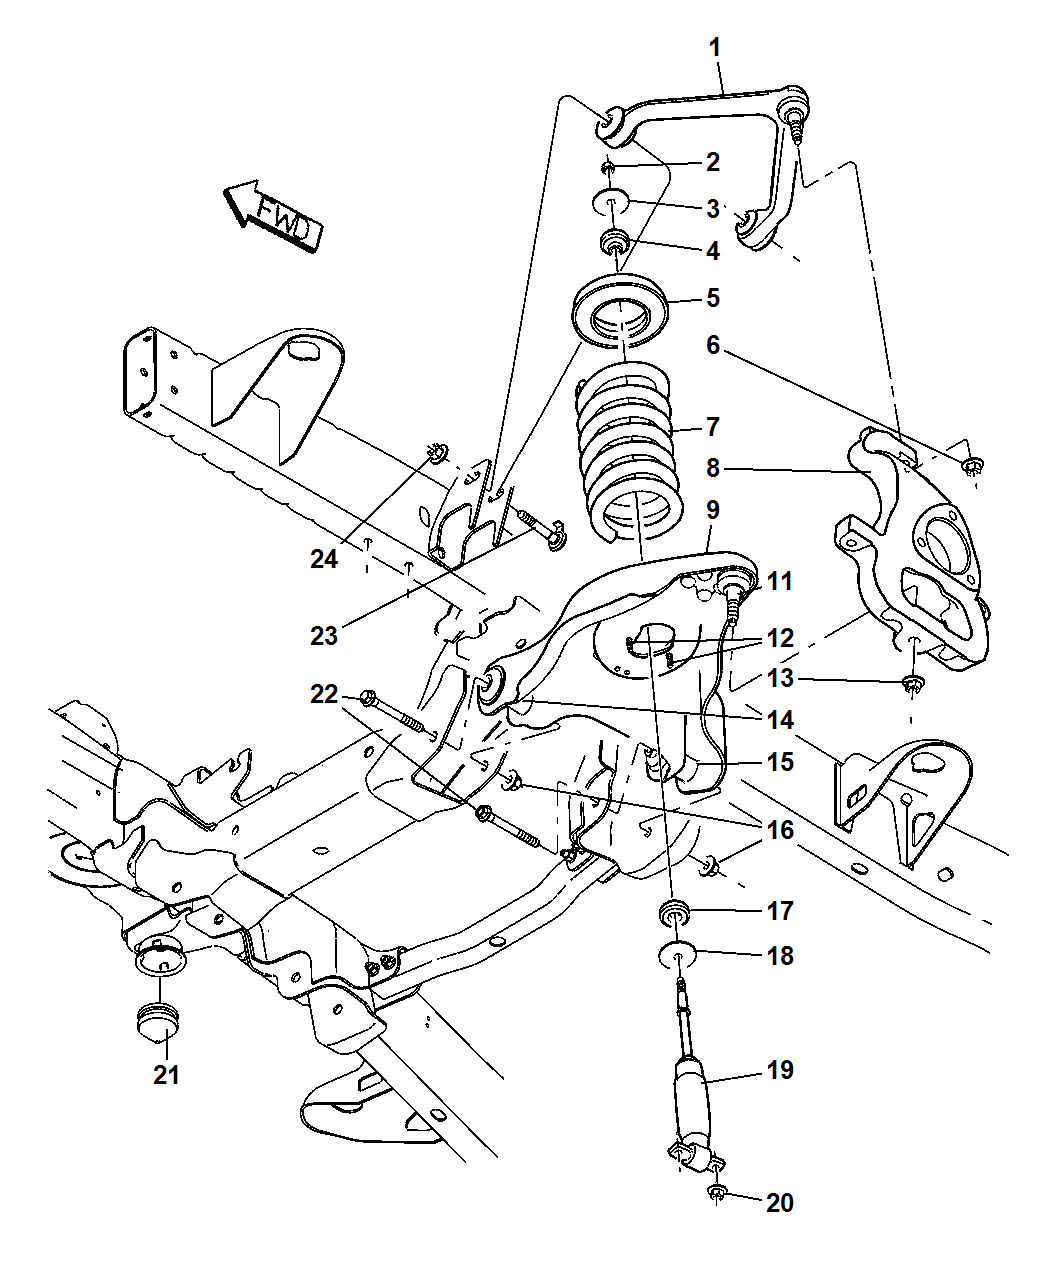 Dodge 1500 Suspension Diagram Center Wiring Diagram Tan External Tan External Iosonointersex It